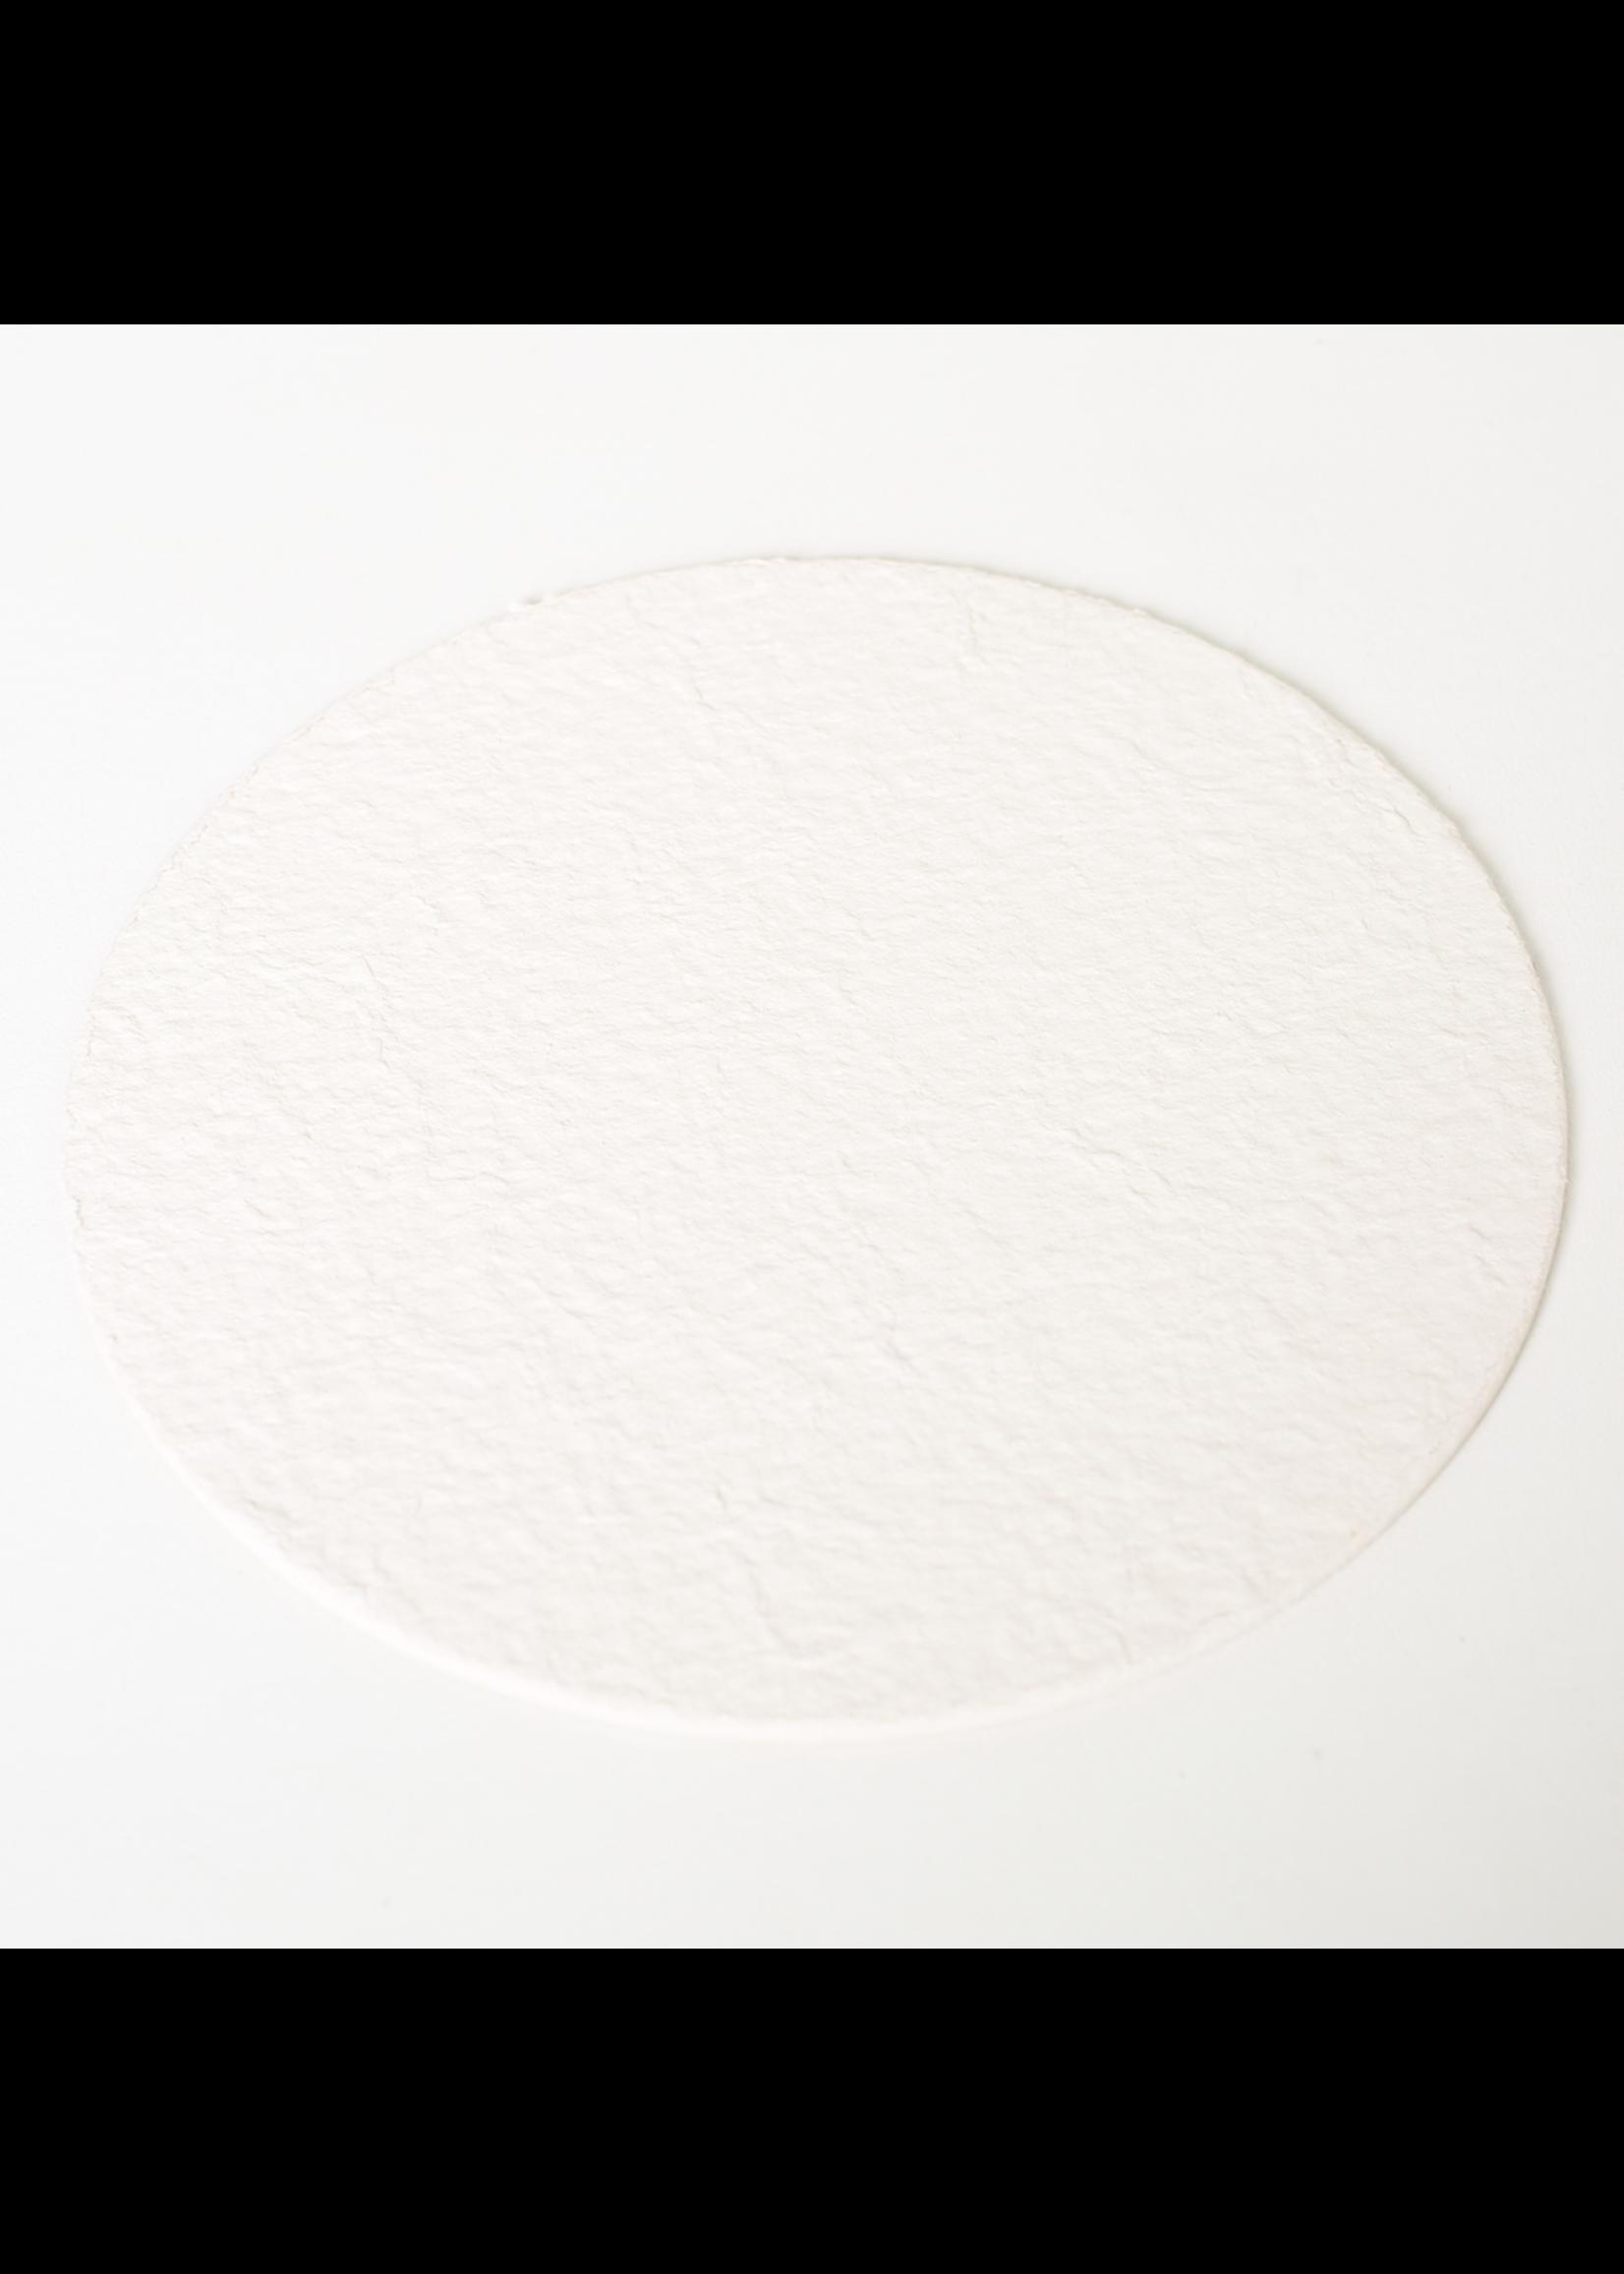 Racking/Bottling Filter Pad - AF3 Medium 1-4 Micron